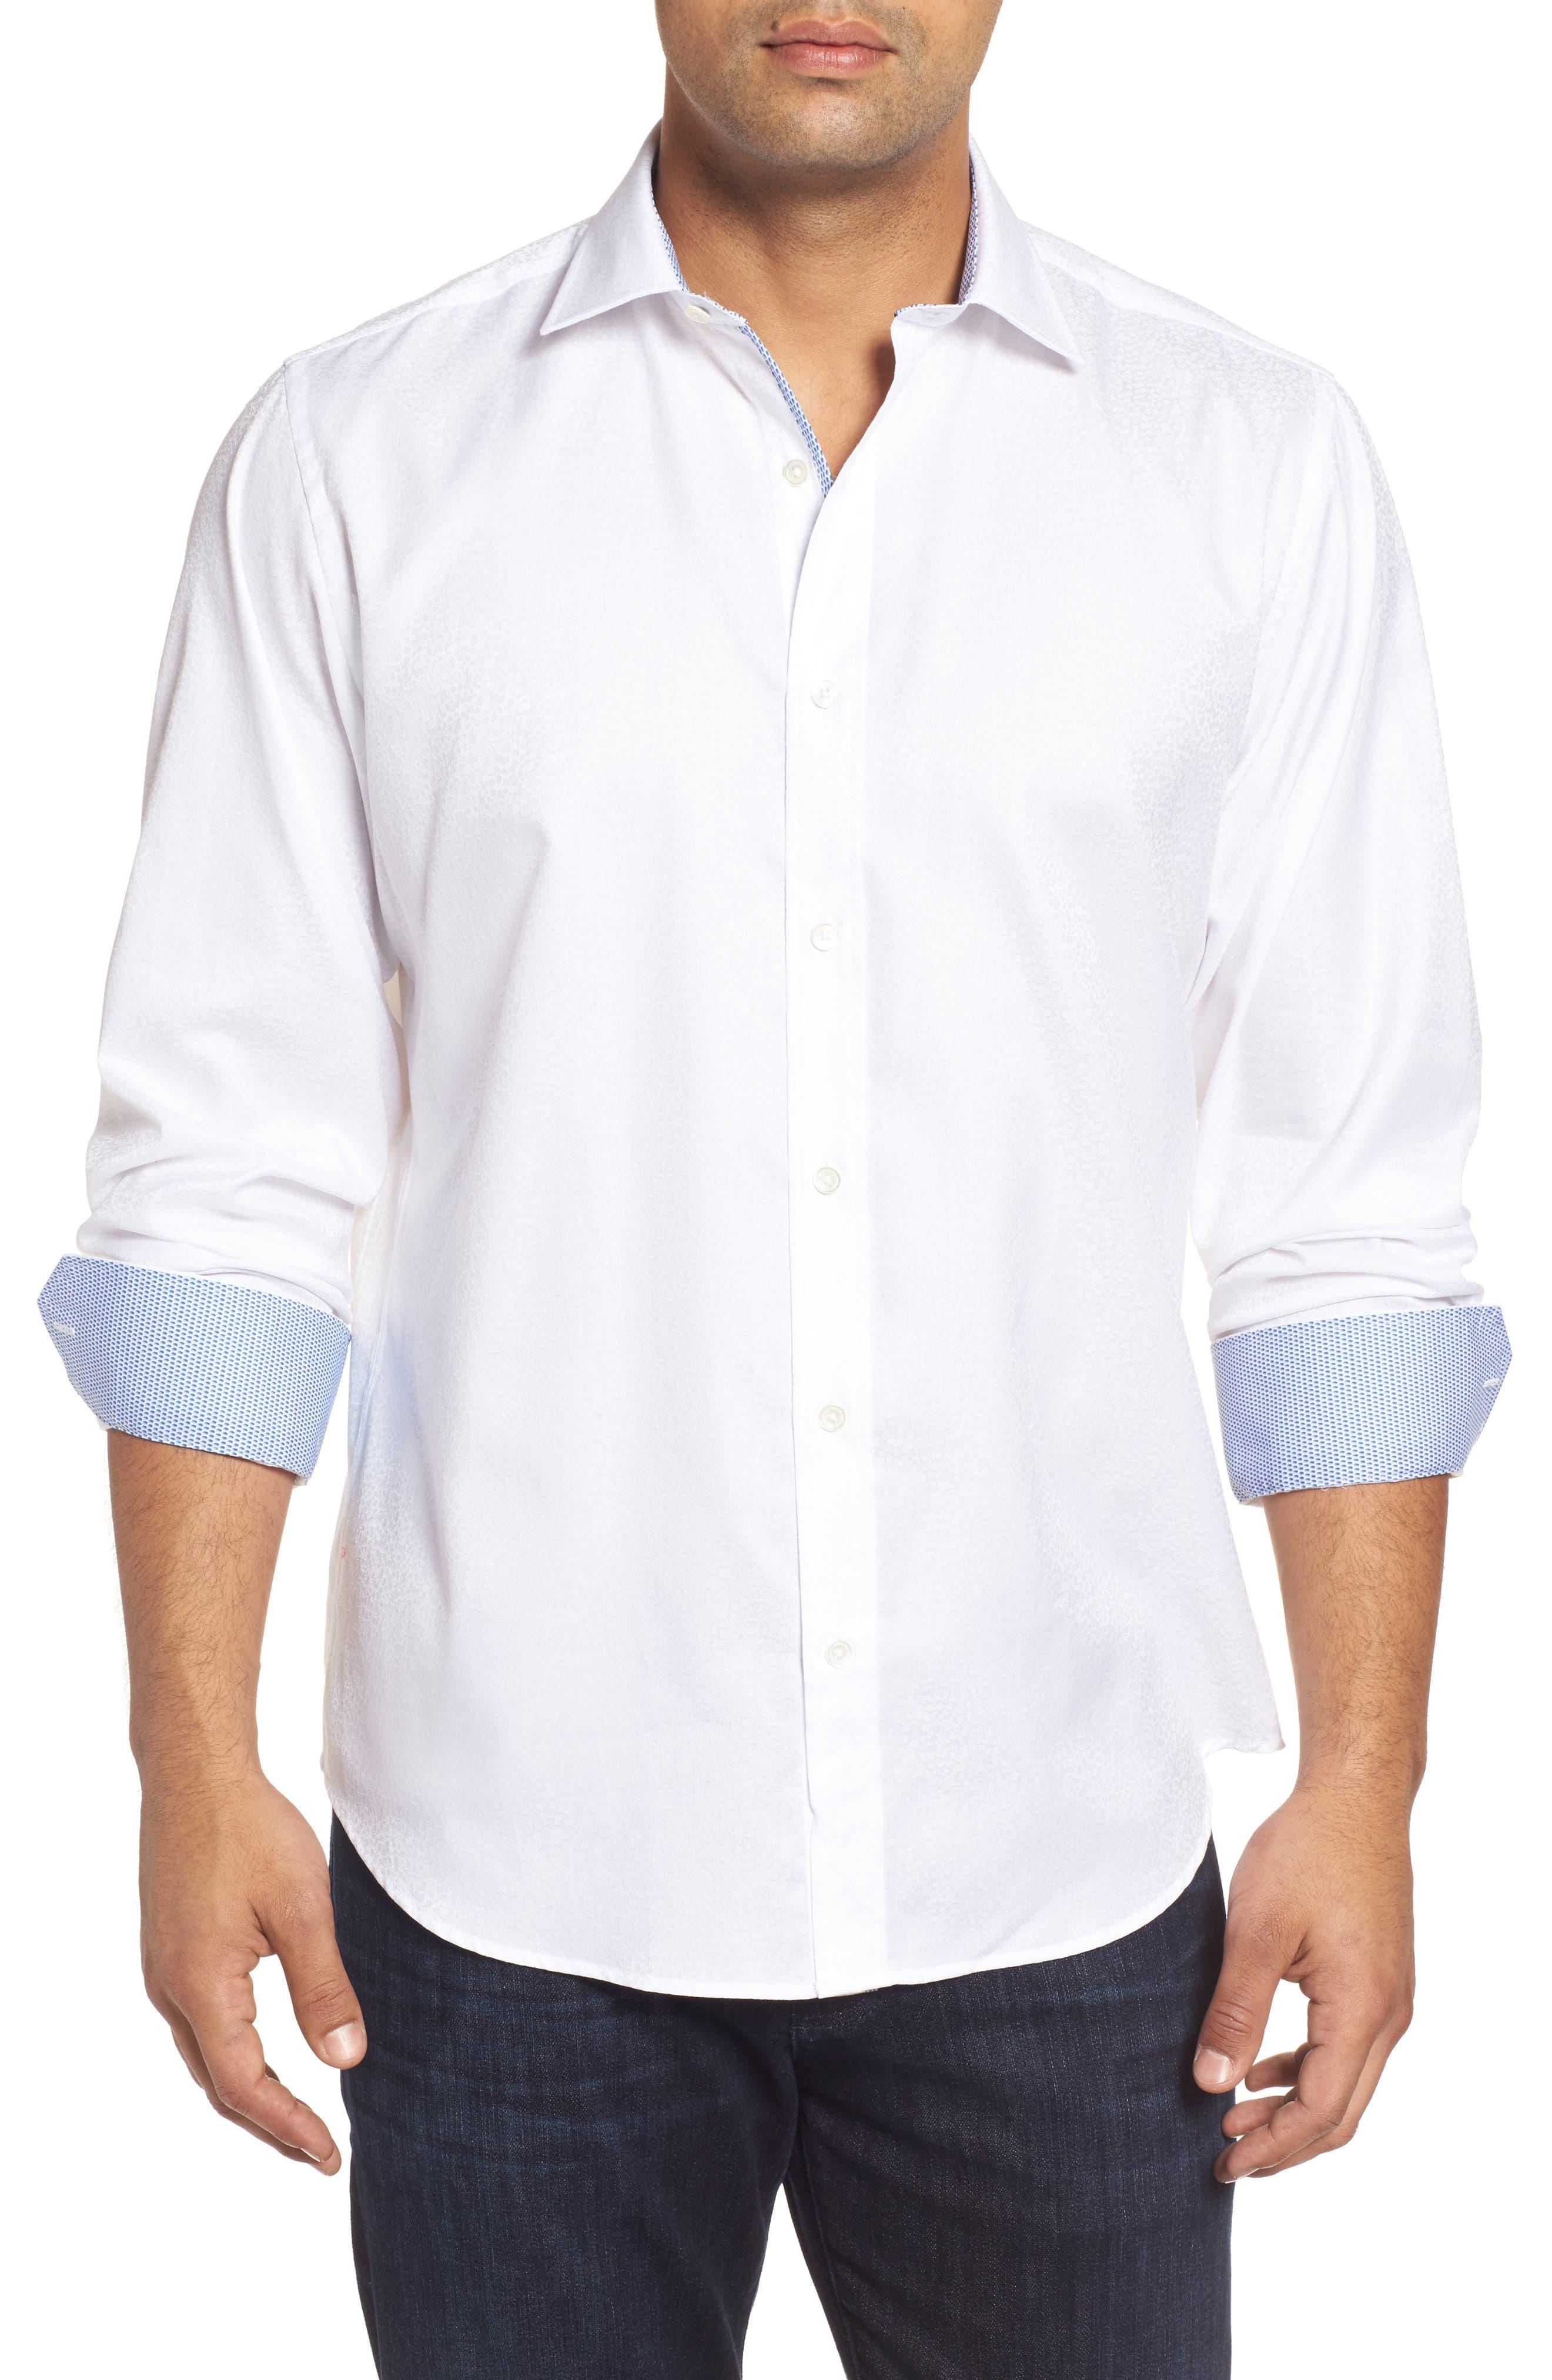 Main Image - Bugatchi Classic Fit Floral Jacquard Sport Shirt